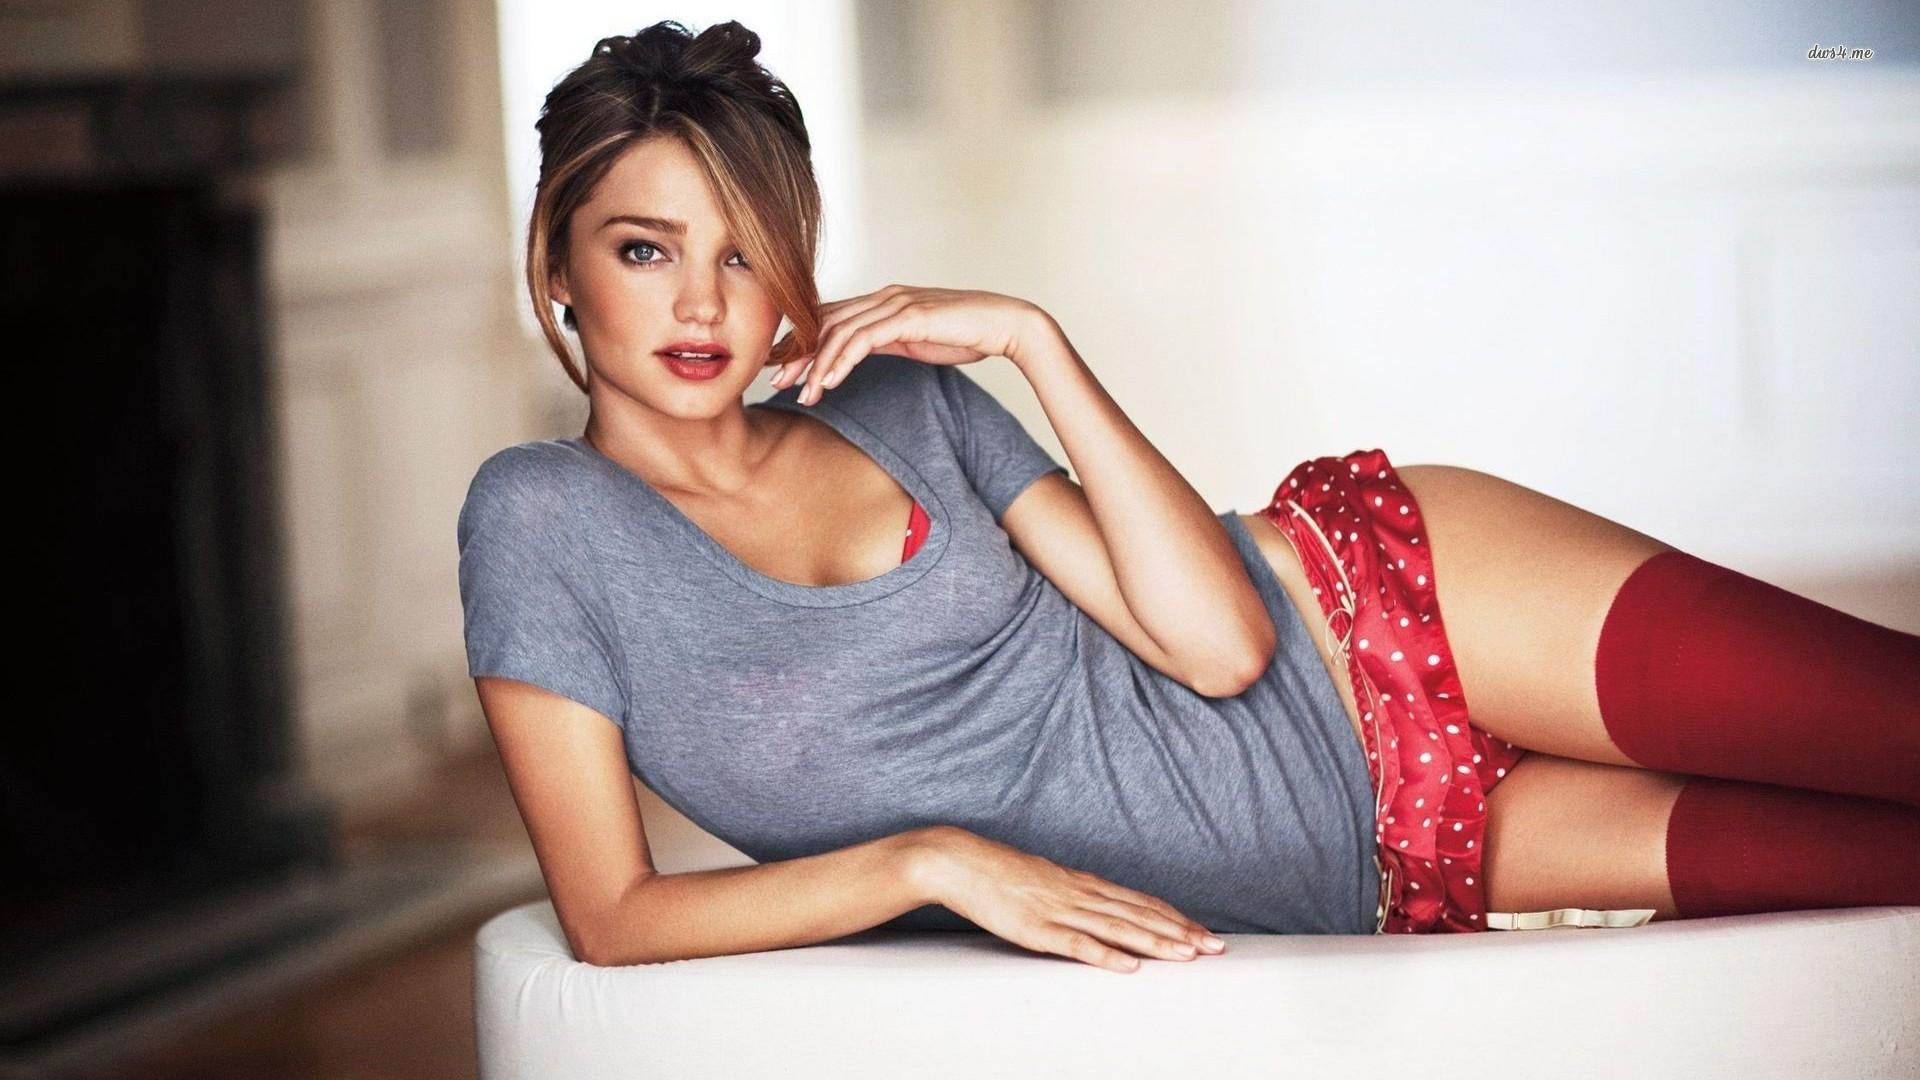 Miranda Kerr Girl HD desktop wallpaper – Girls no.